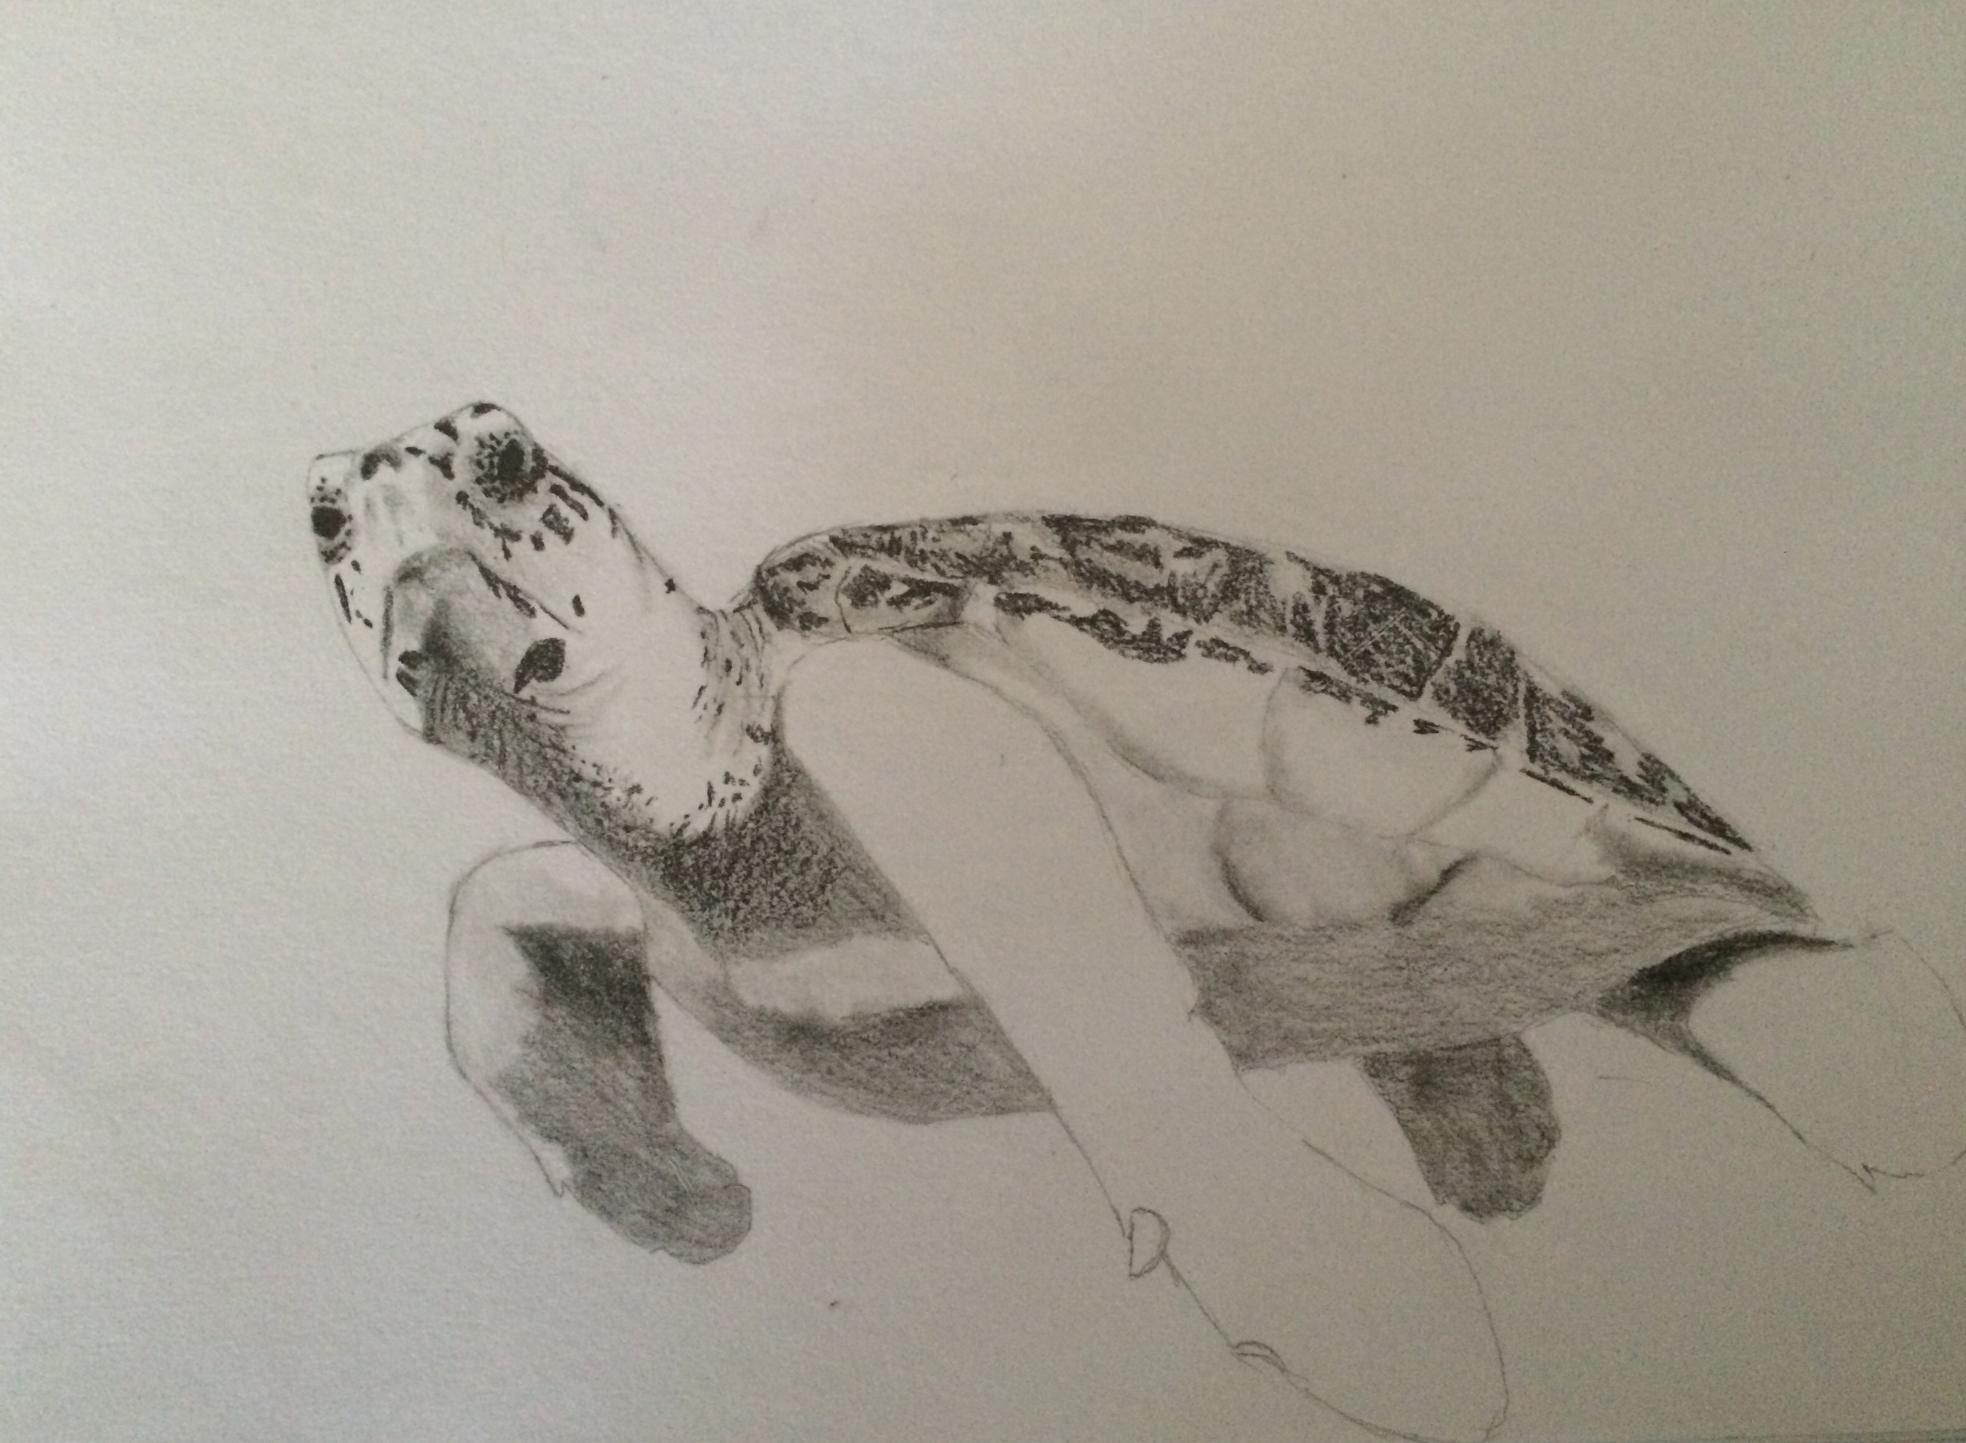 Drawn pencil turtle Details turtle drawing ilovenewbies more